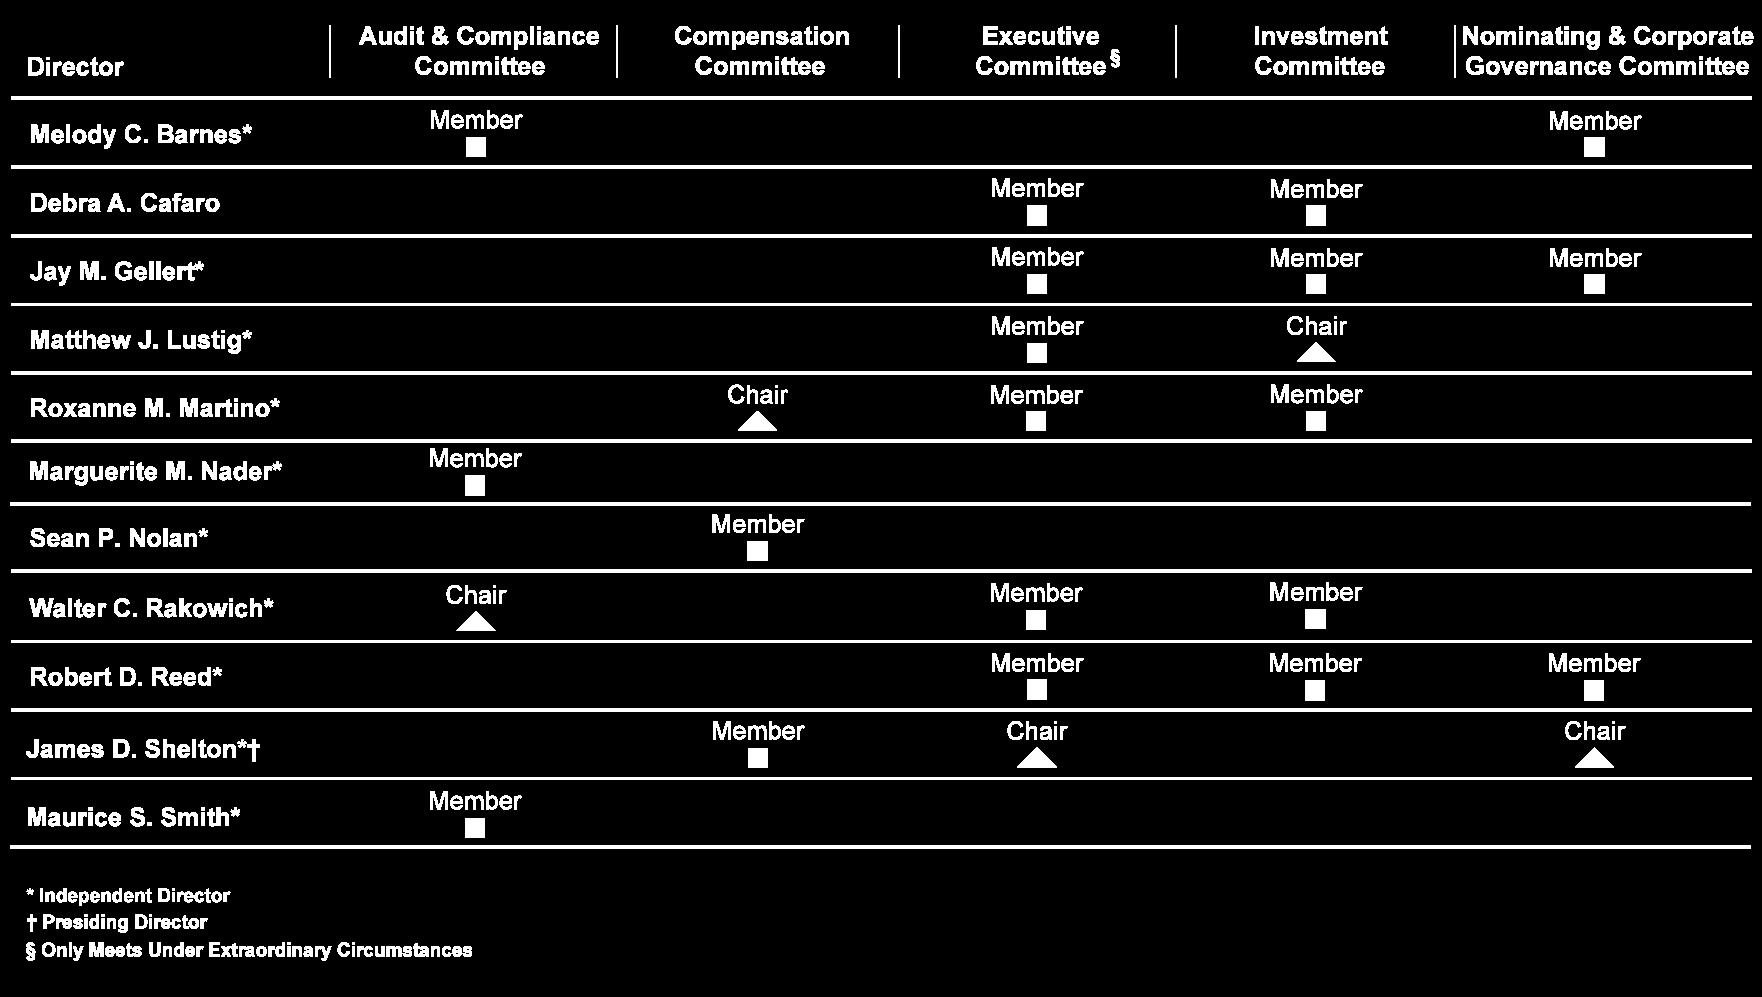 Board Membership Overview